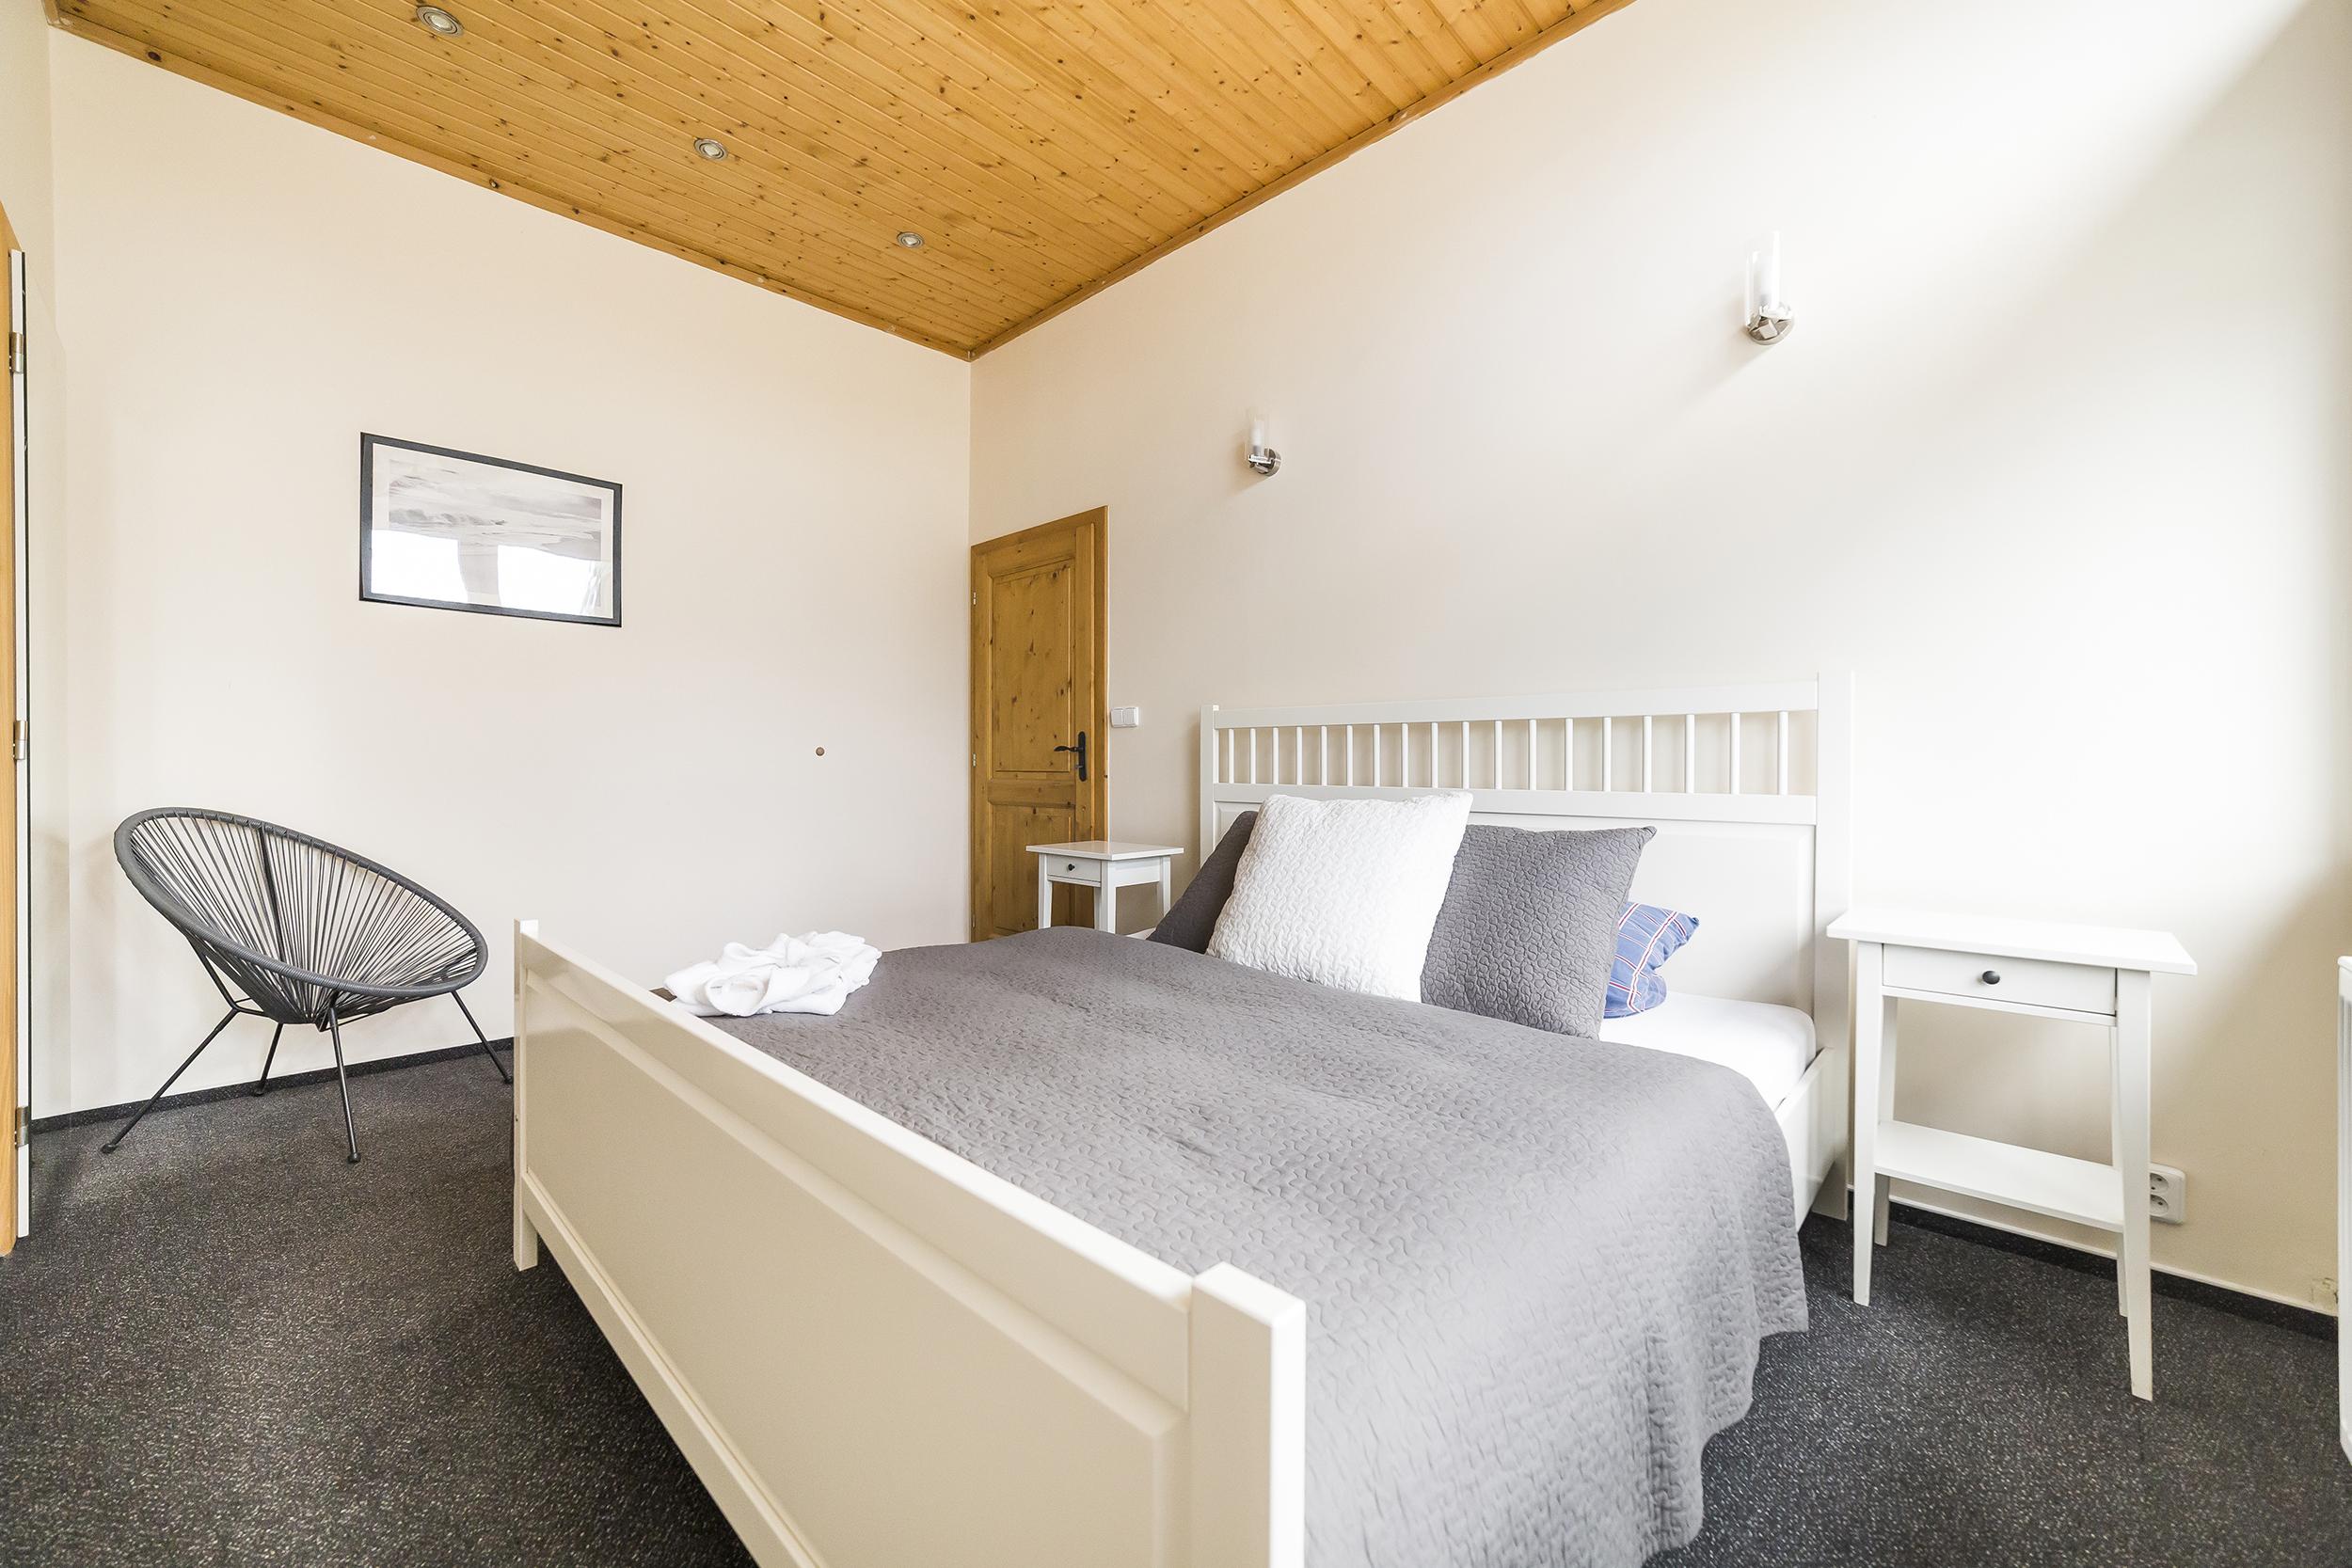 apartman radunka postel pokoj zidle obraz svetlo prehoz polstar prodej domu radun linda bittova